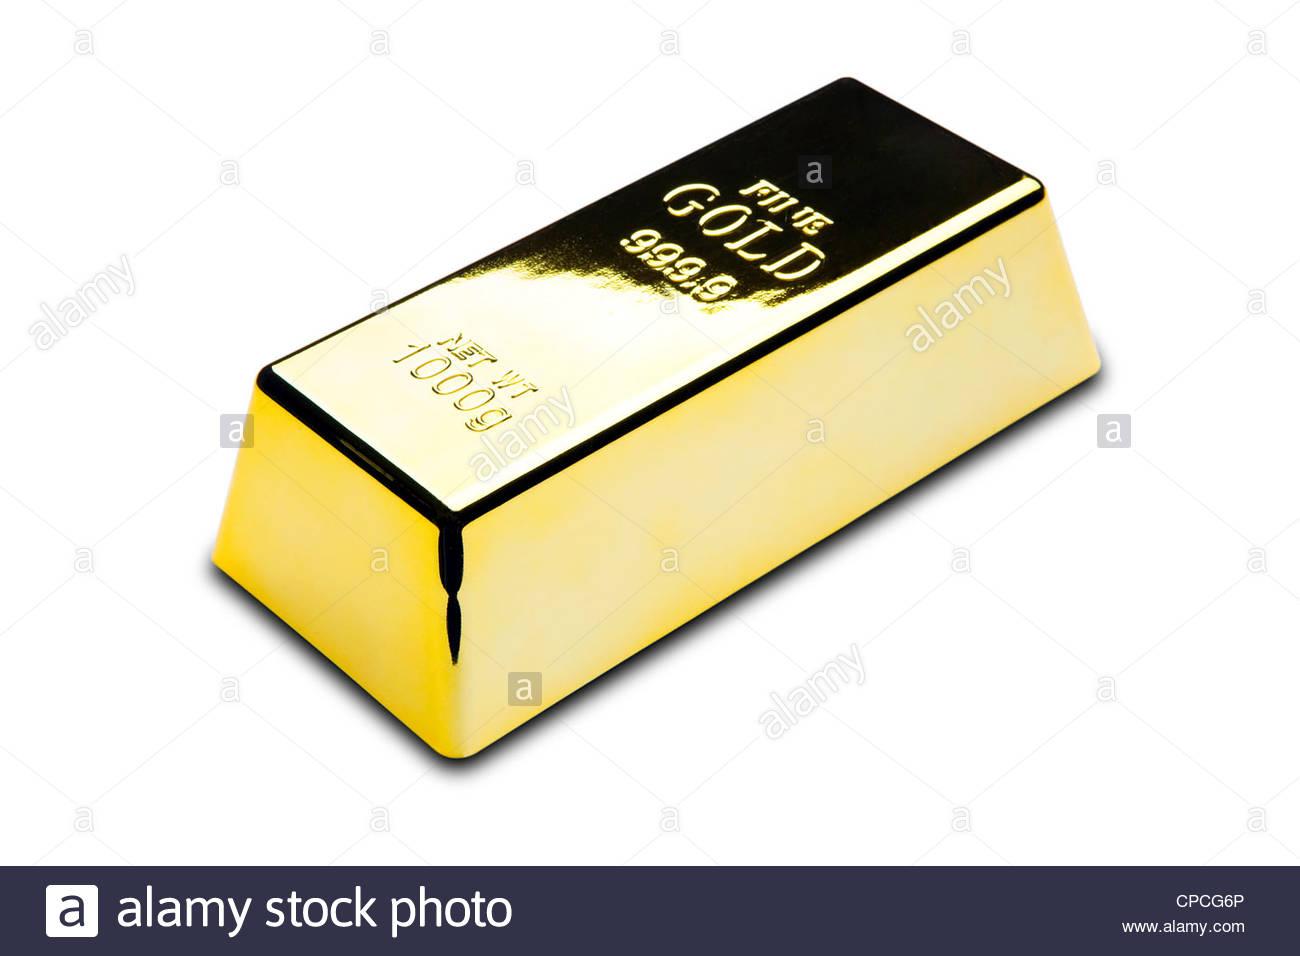 Gold bar - Stock Image